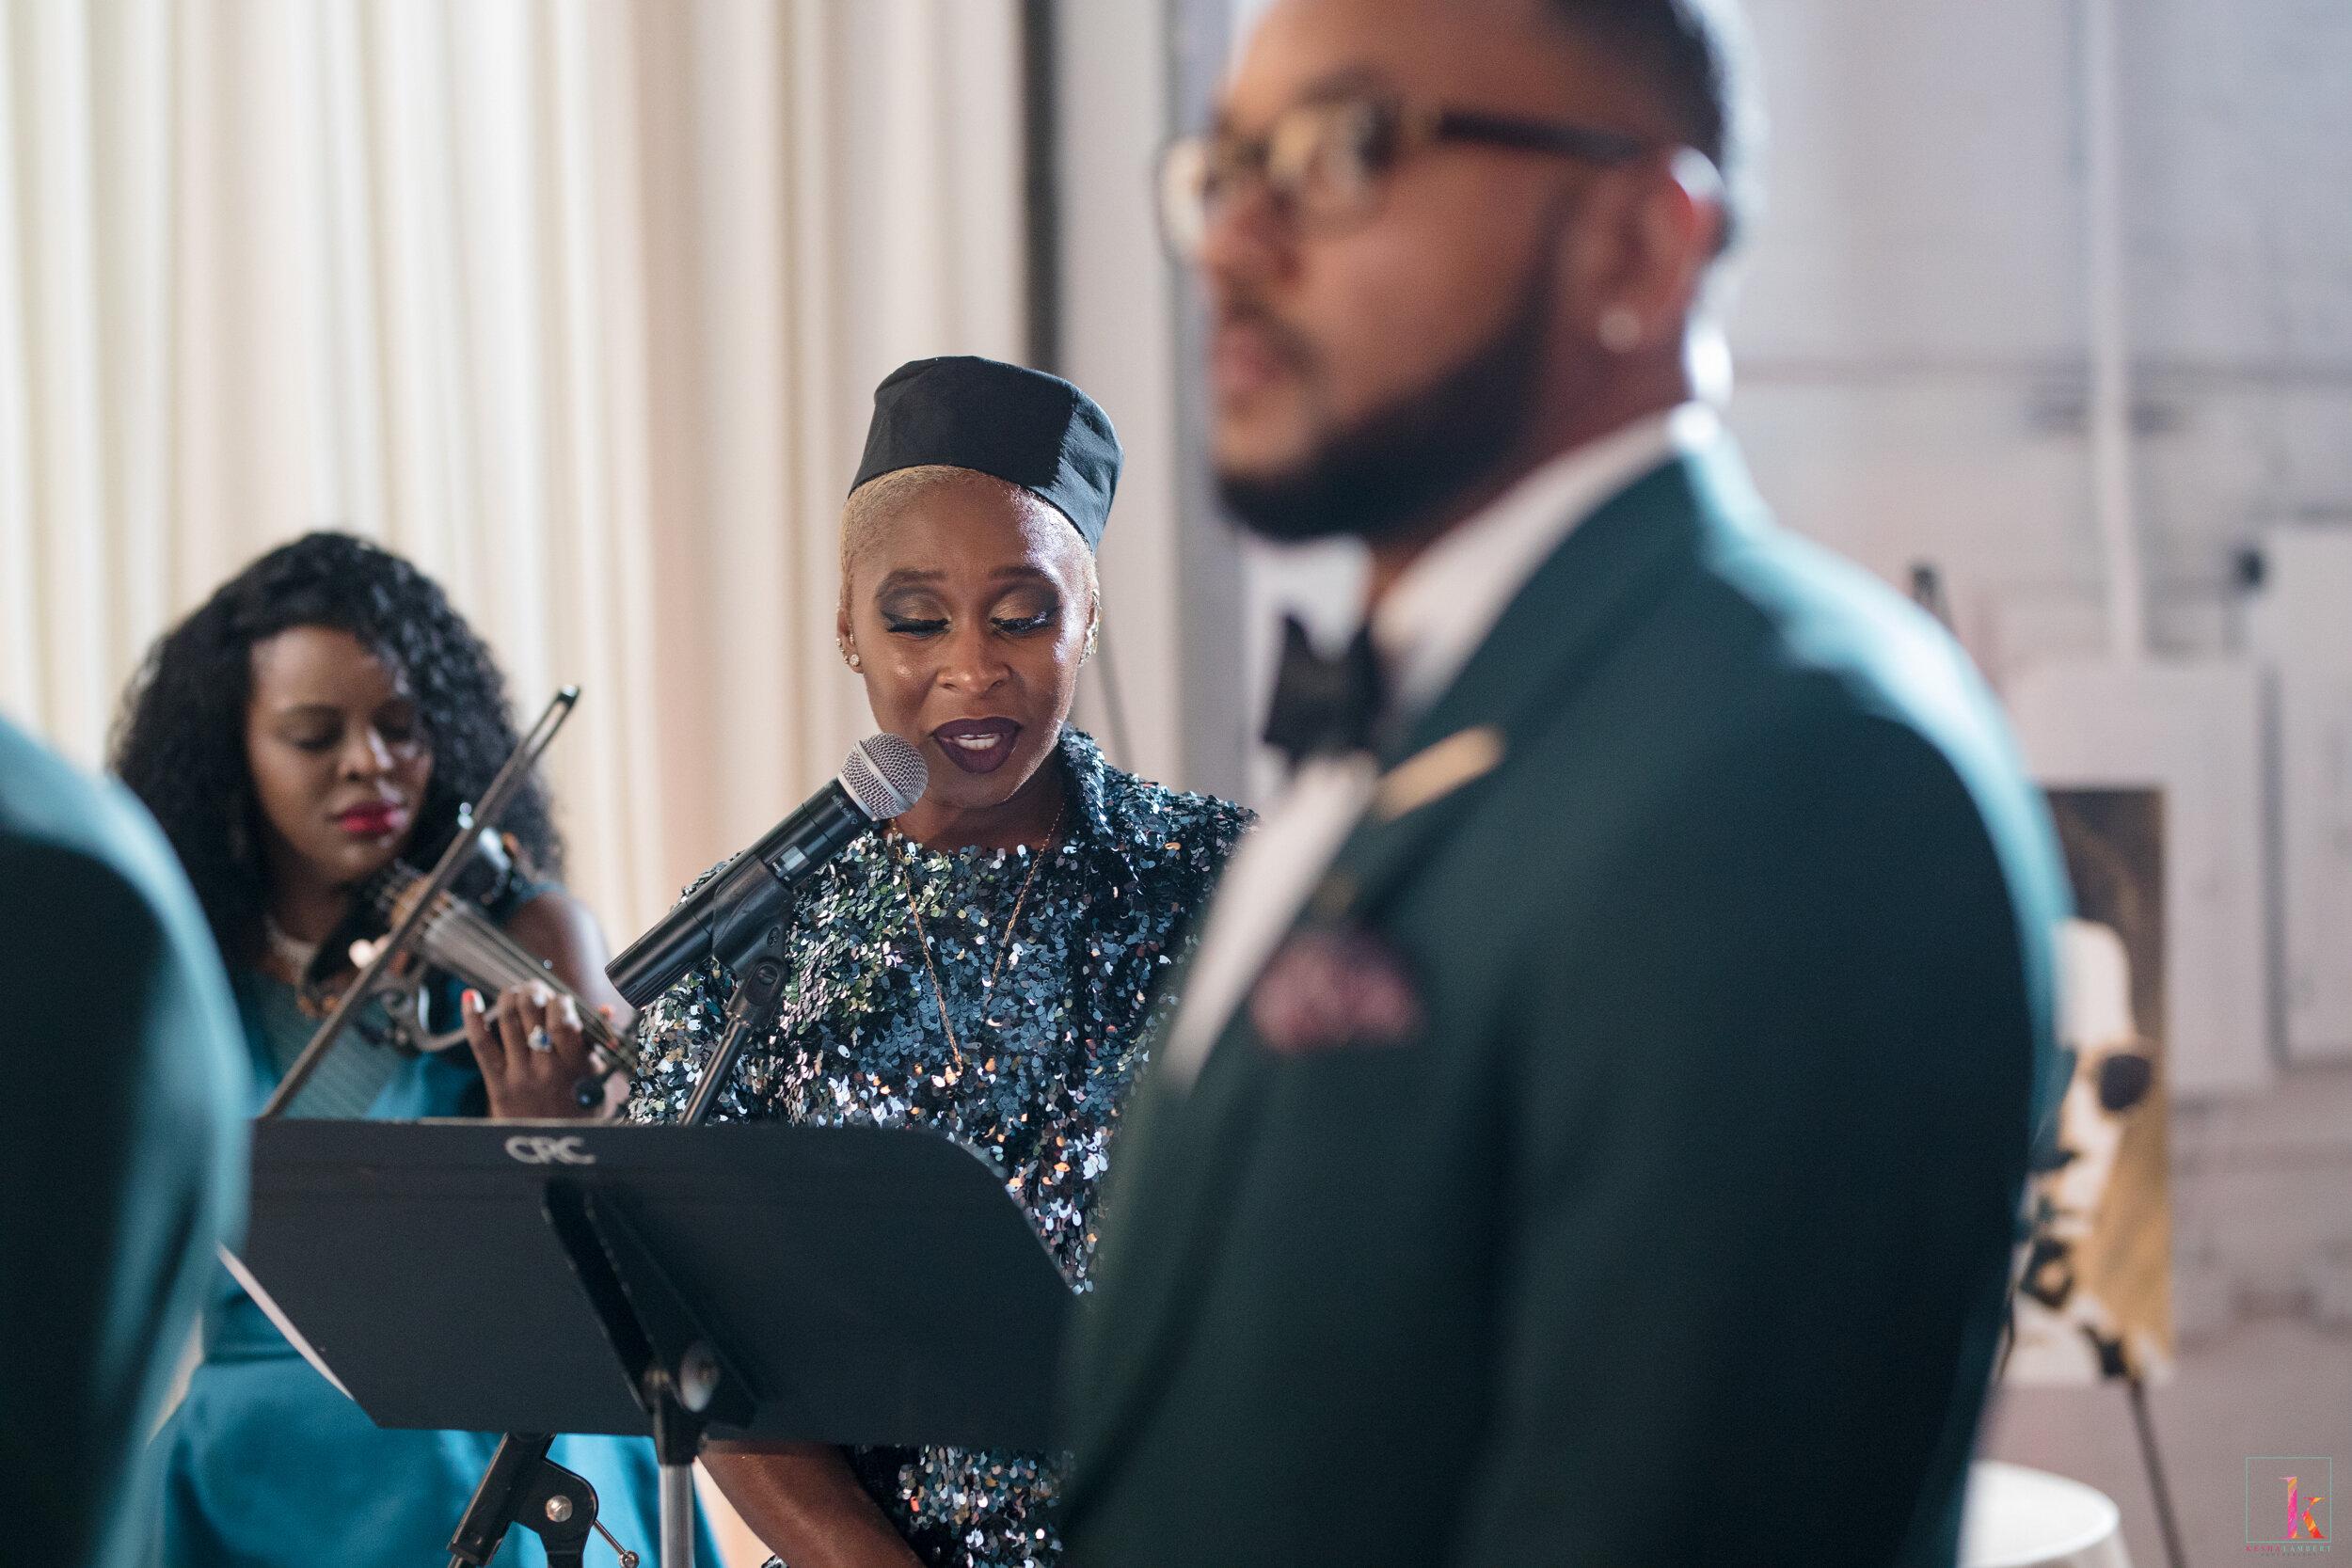 Luvvie Ajayi and Carnell Jones Wedding Celebration Cynthia Erivo